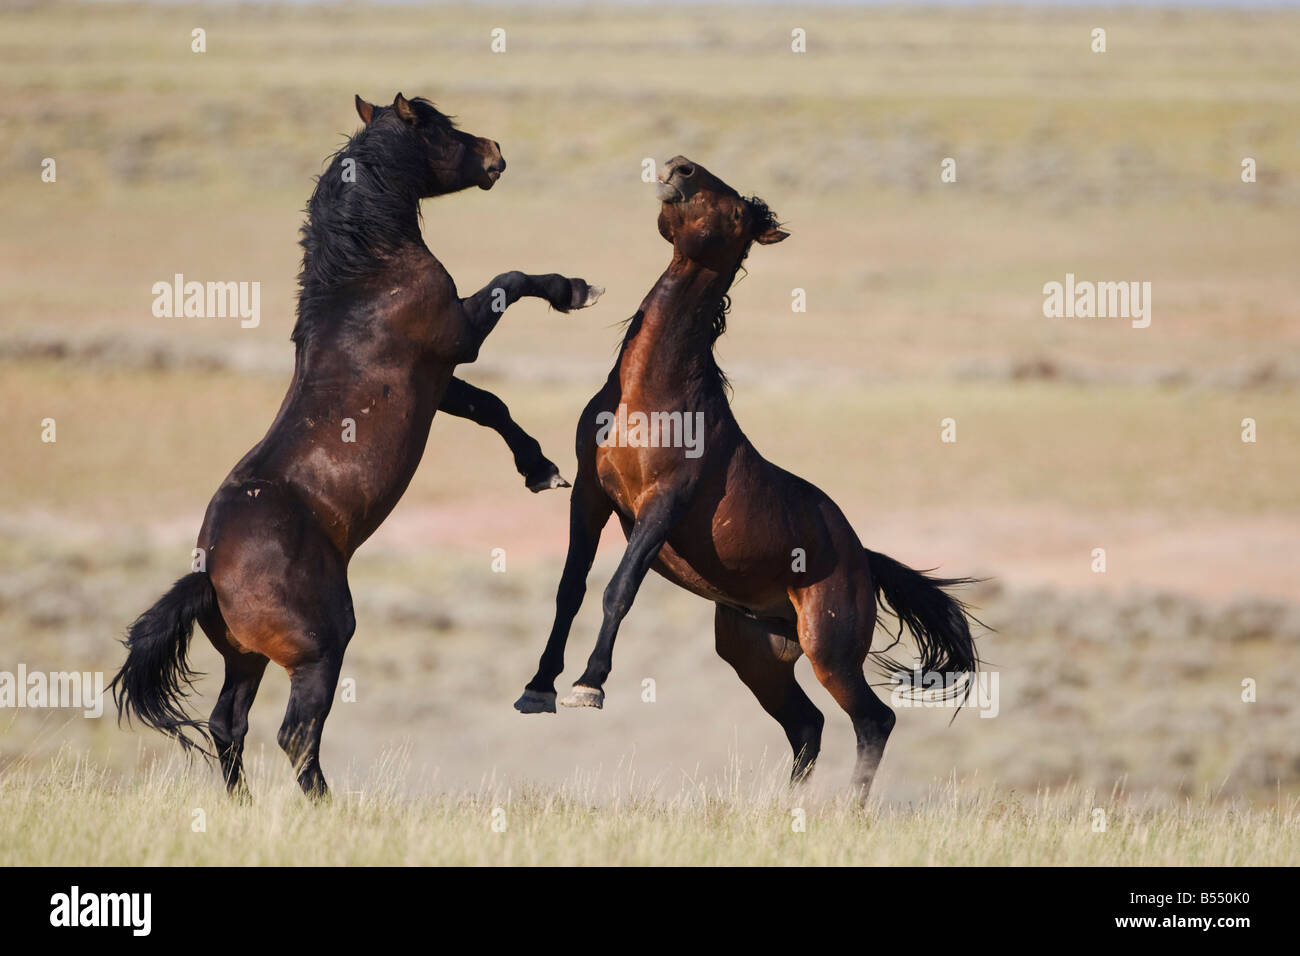 Caballo Mustang Equus caballus sementales combates Pryor Mountain Wild Horse Gama Montana EE.UU. Imagen De Stock